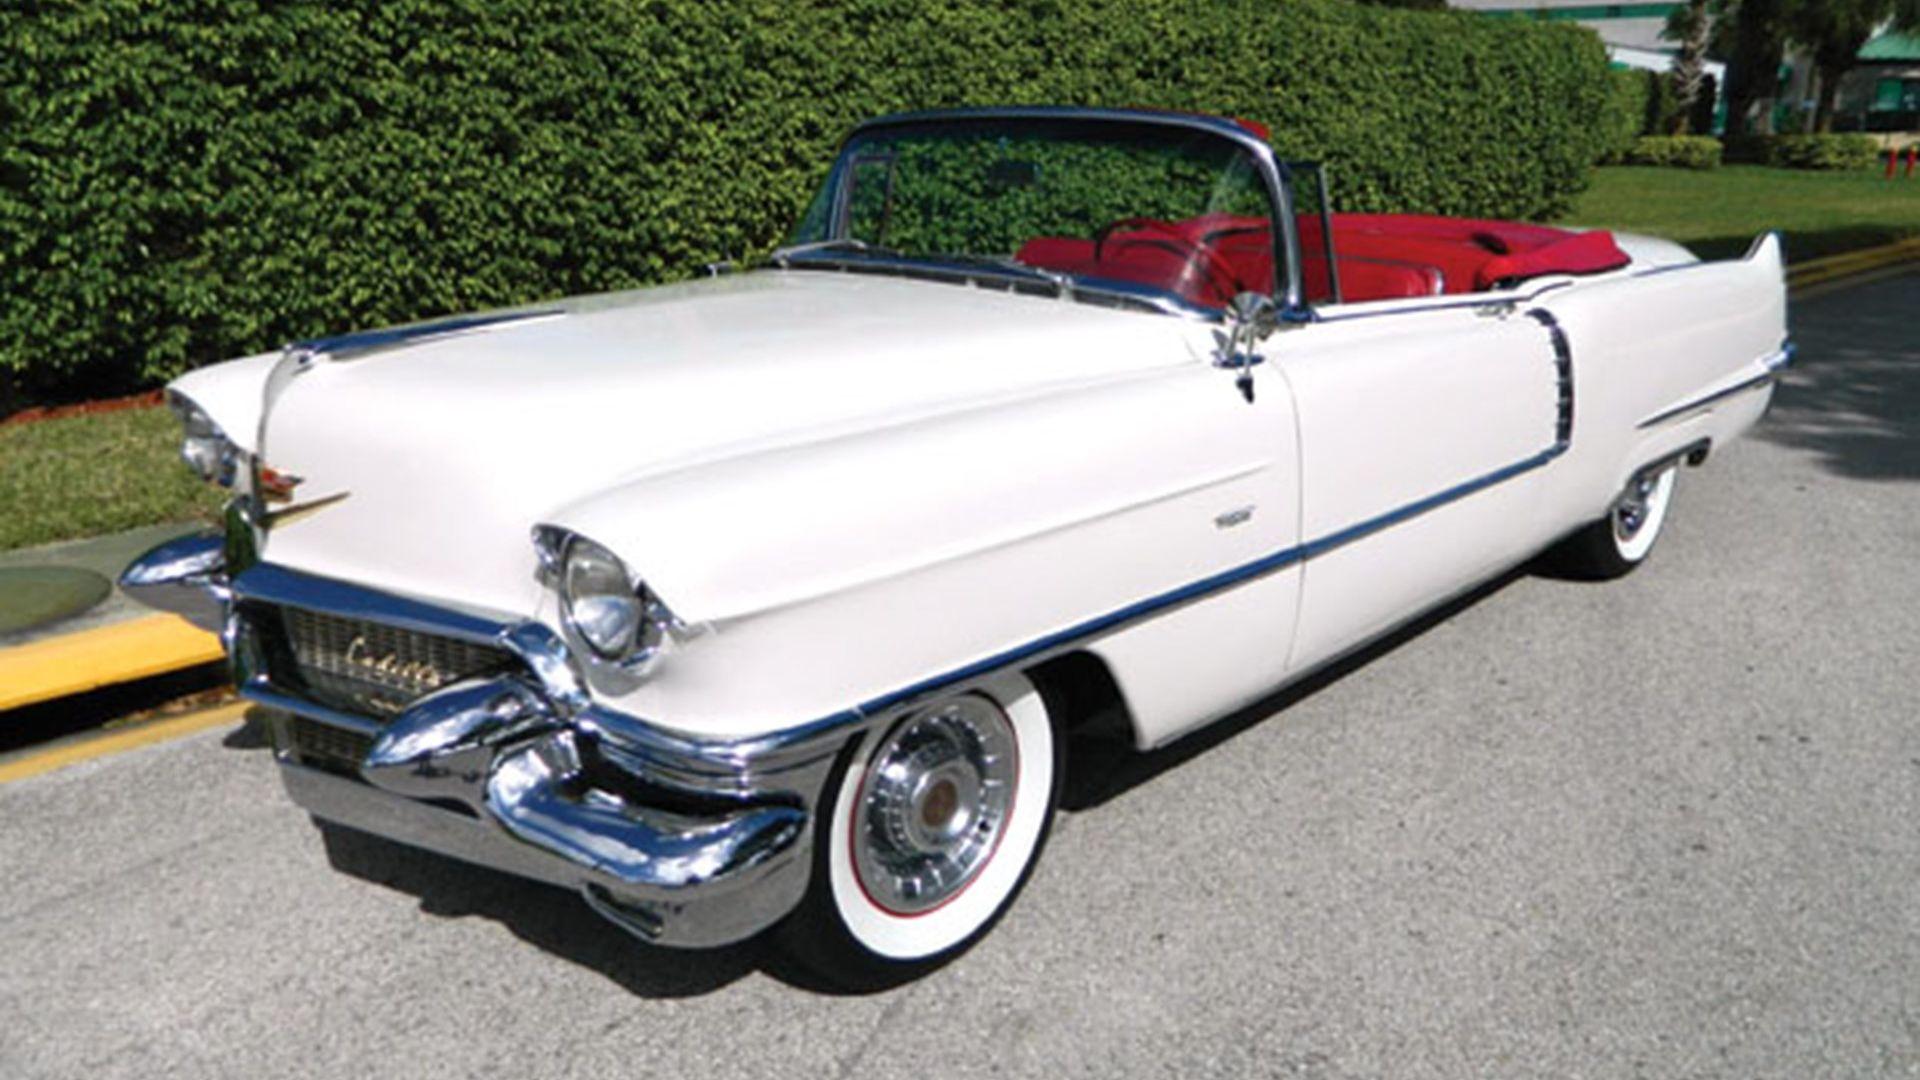 1956 Cadillac Series 62 Restomod